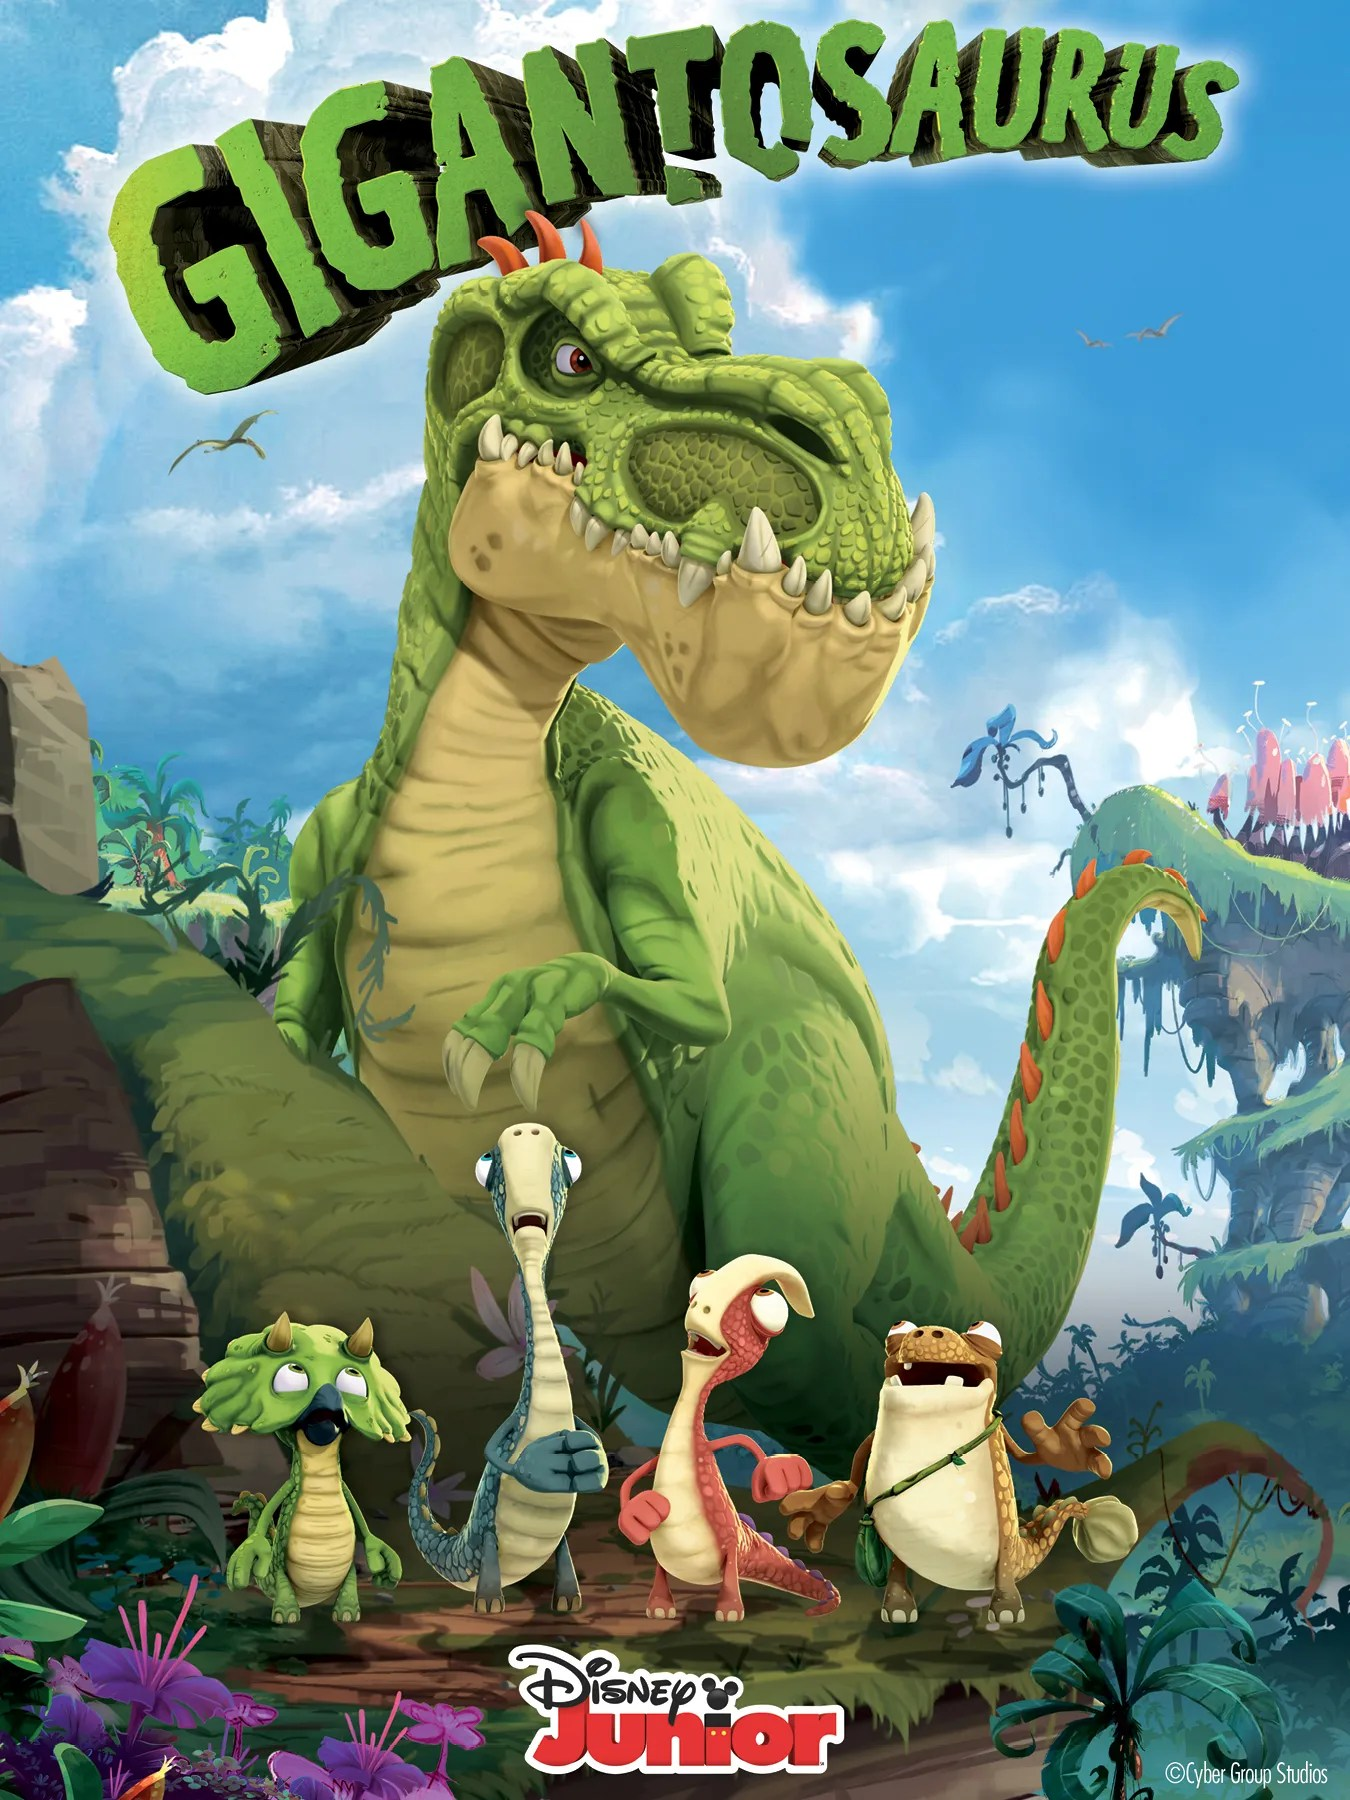 Gigantosaurus Disney Channel S Newest Show Premieres Today